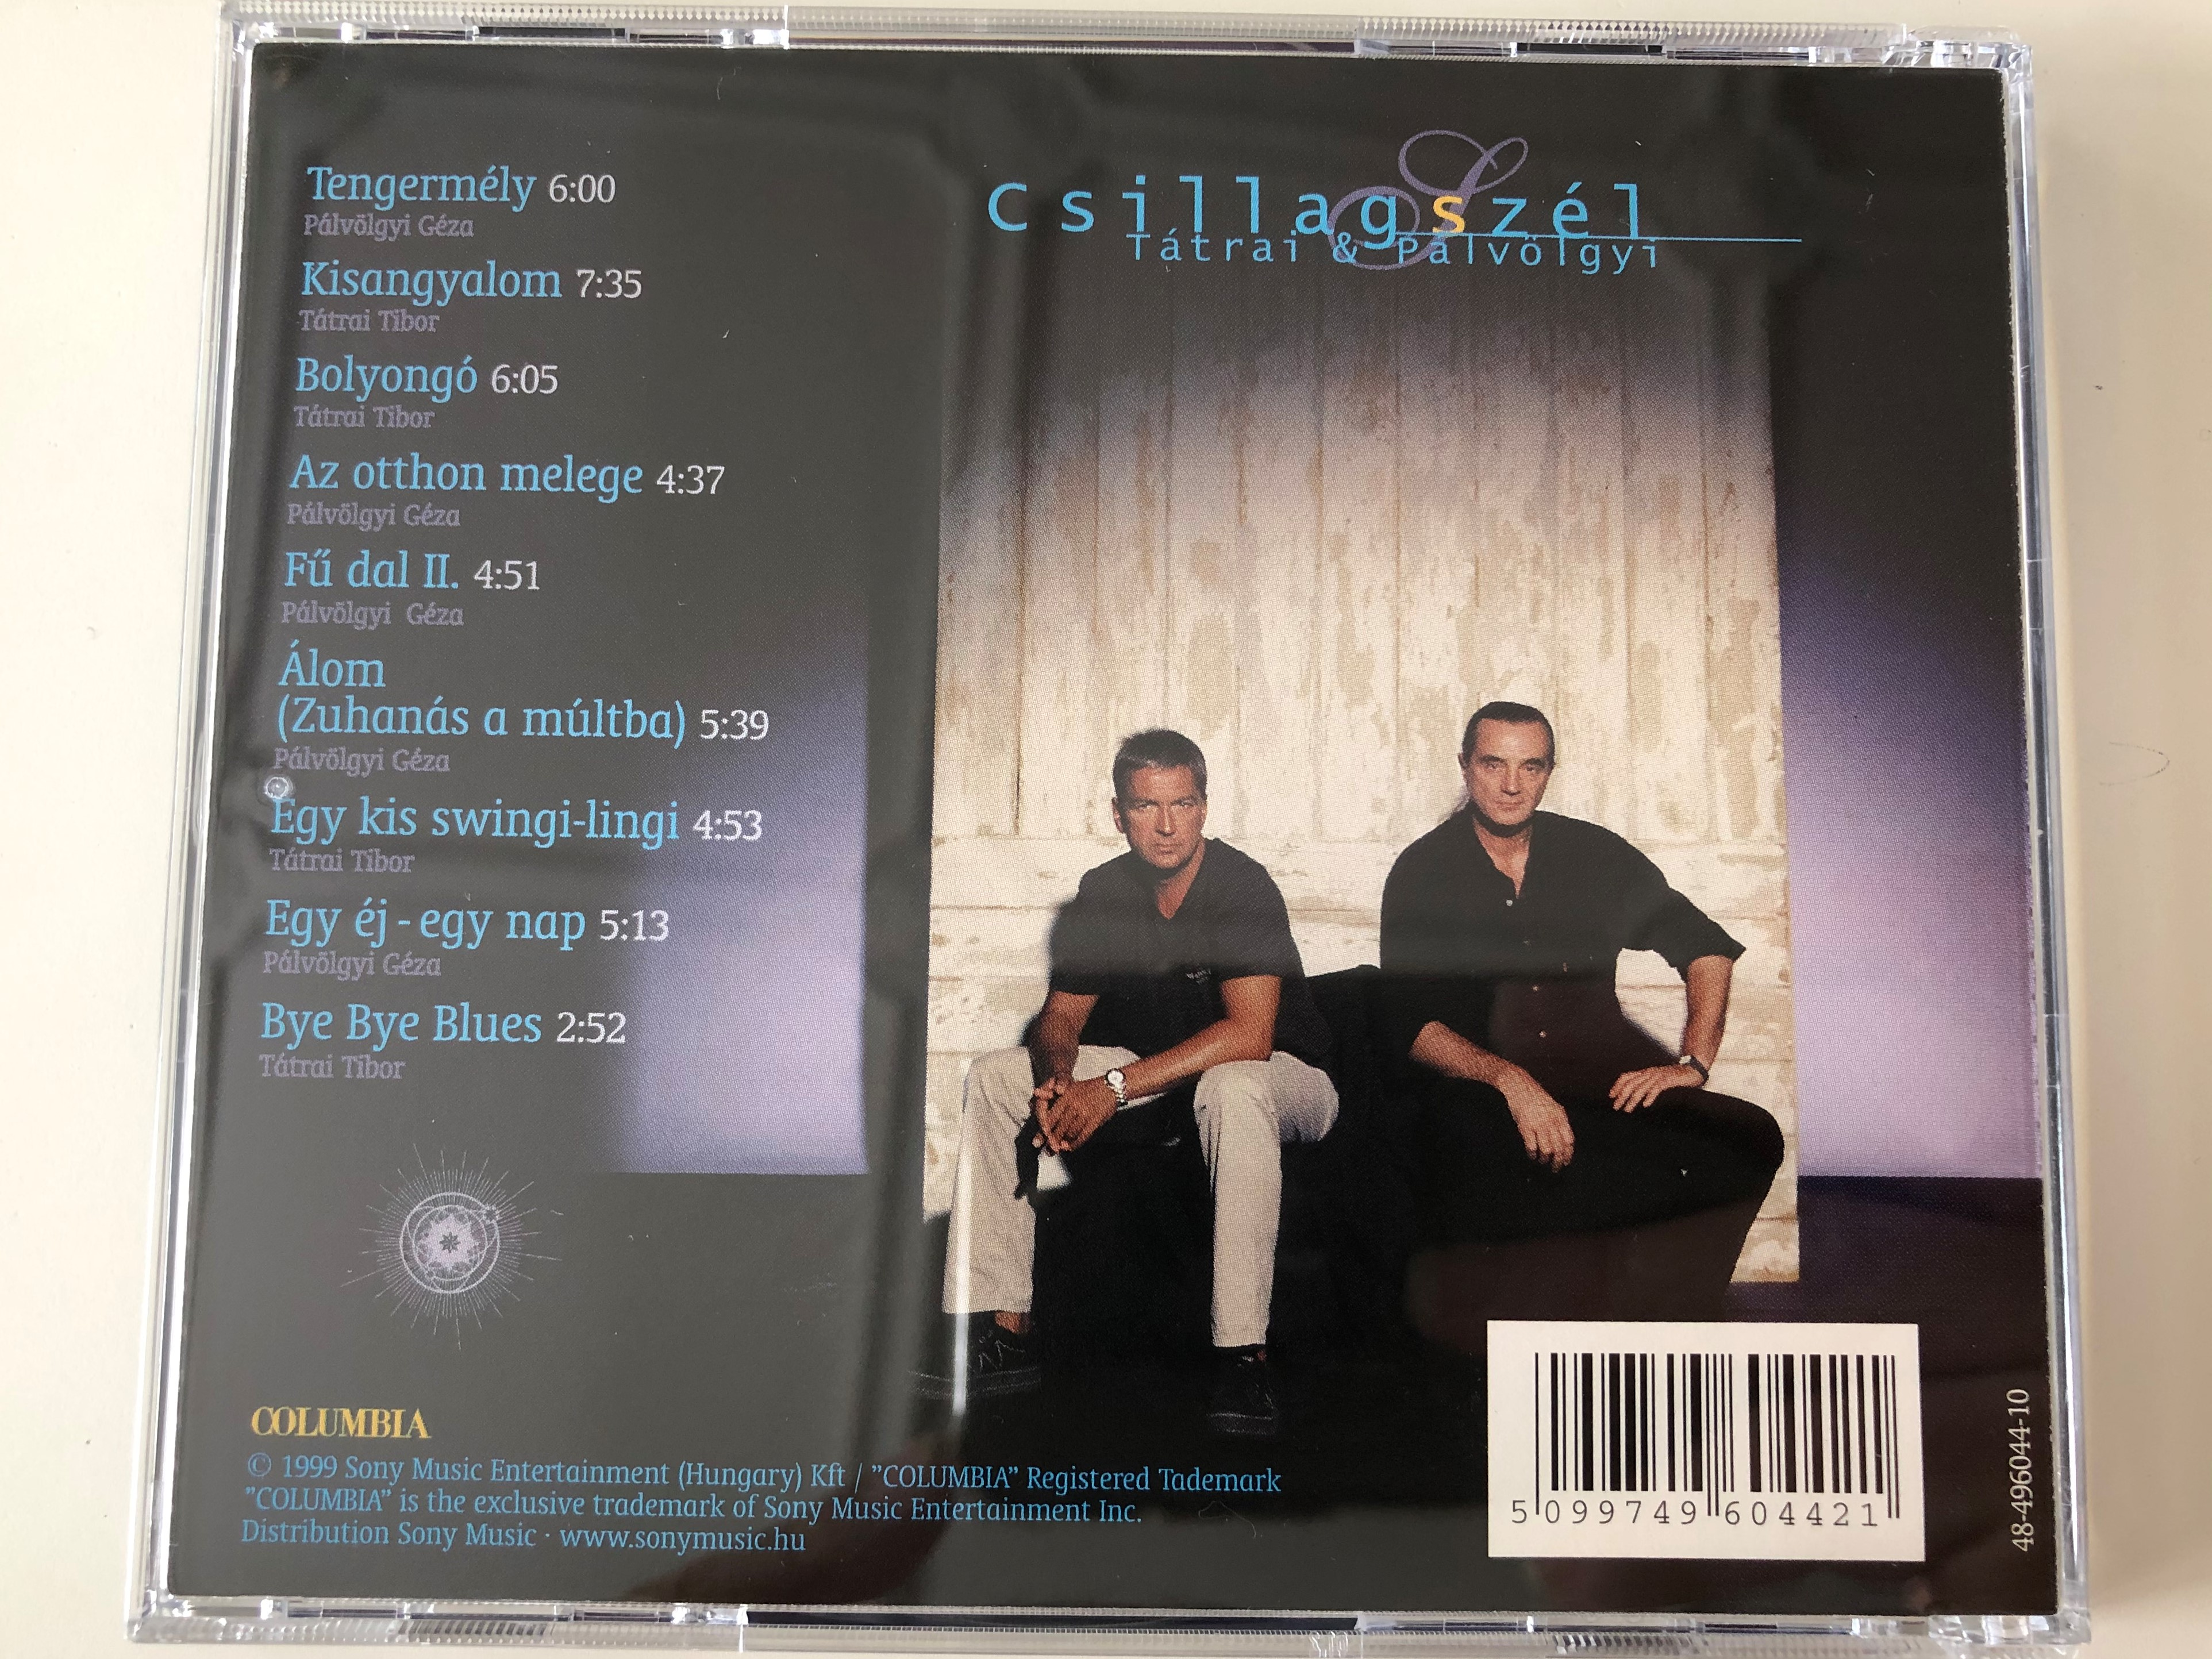 csillagsz-l-t-trai-p-lv-lgyi-columbia-audio-cd-1999-col-496044-2-7-.jpg